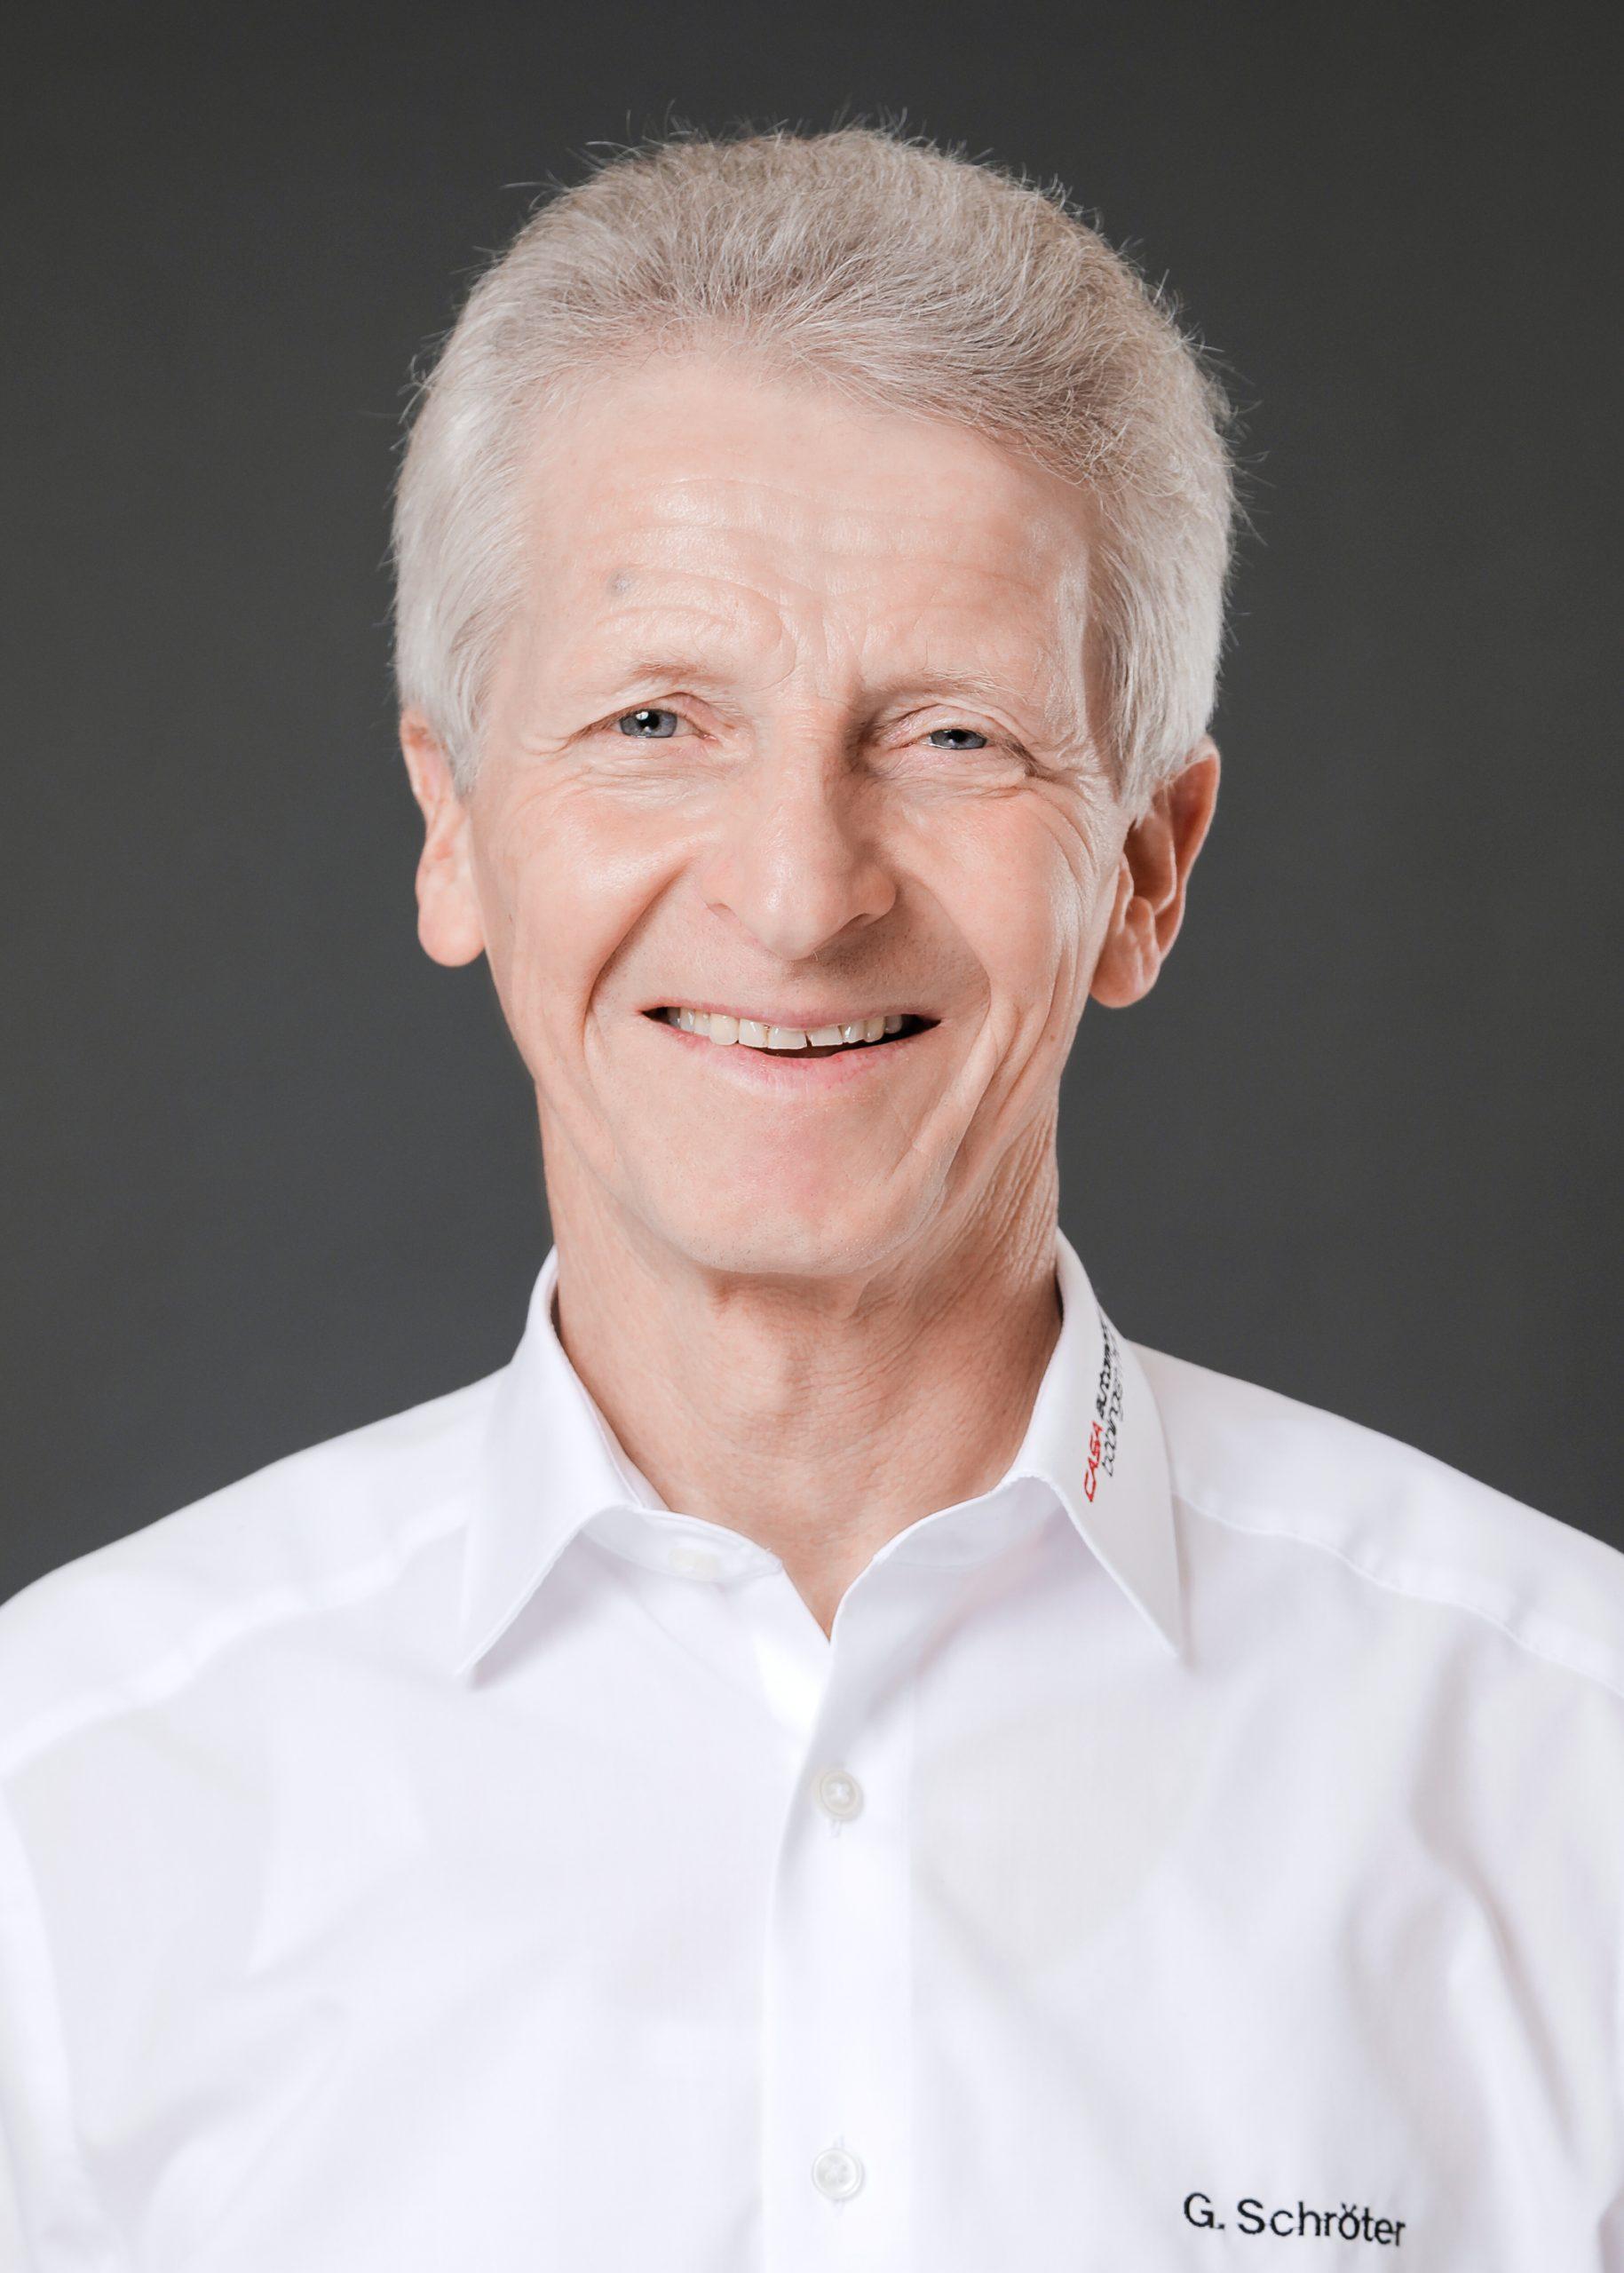 Gerd Schröter